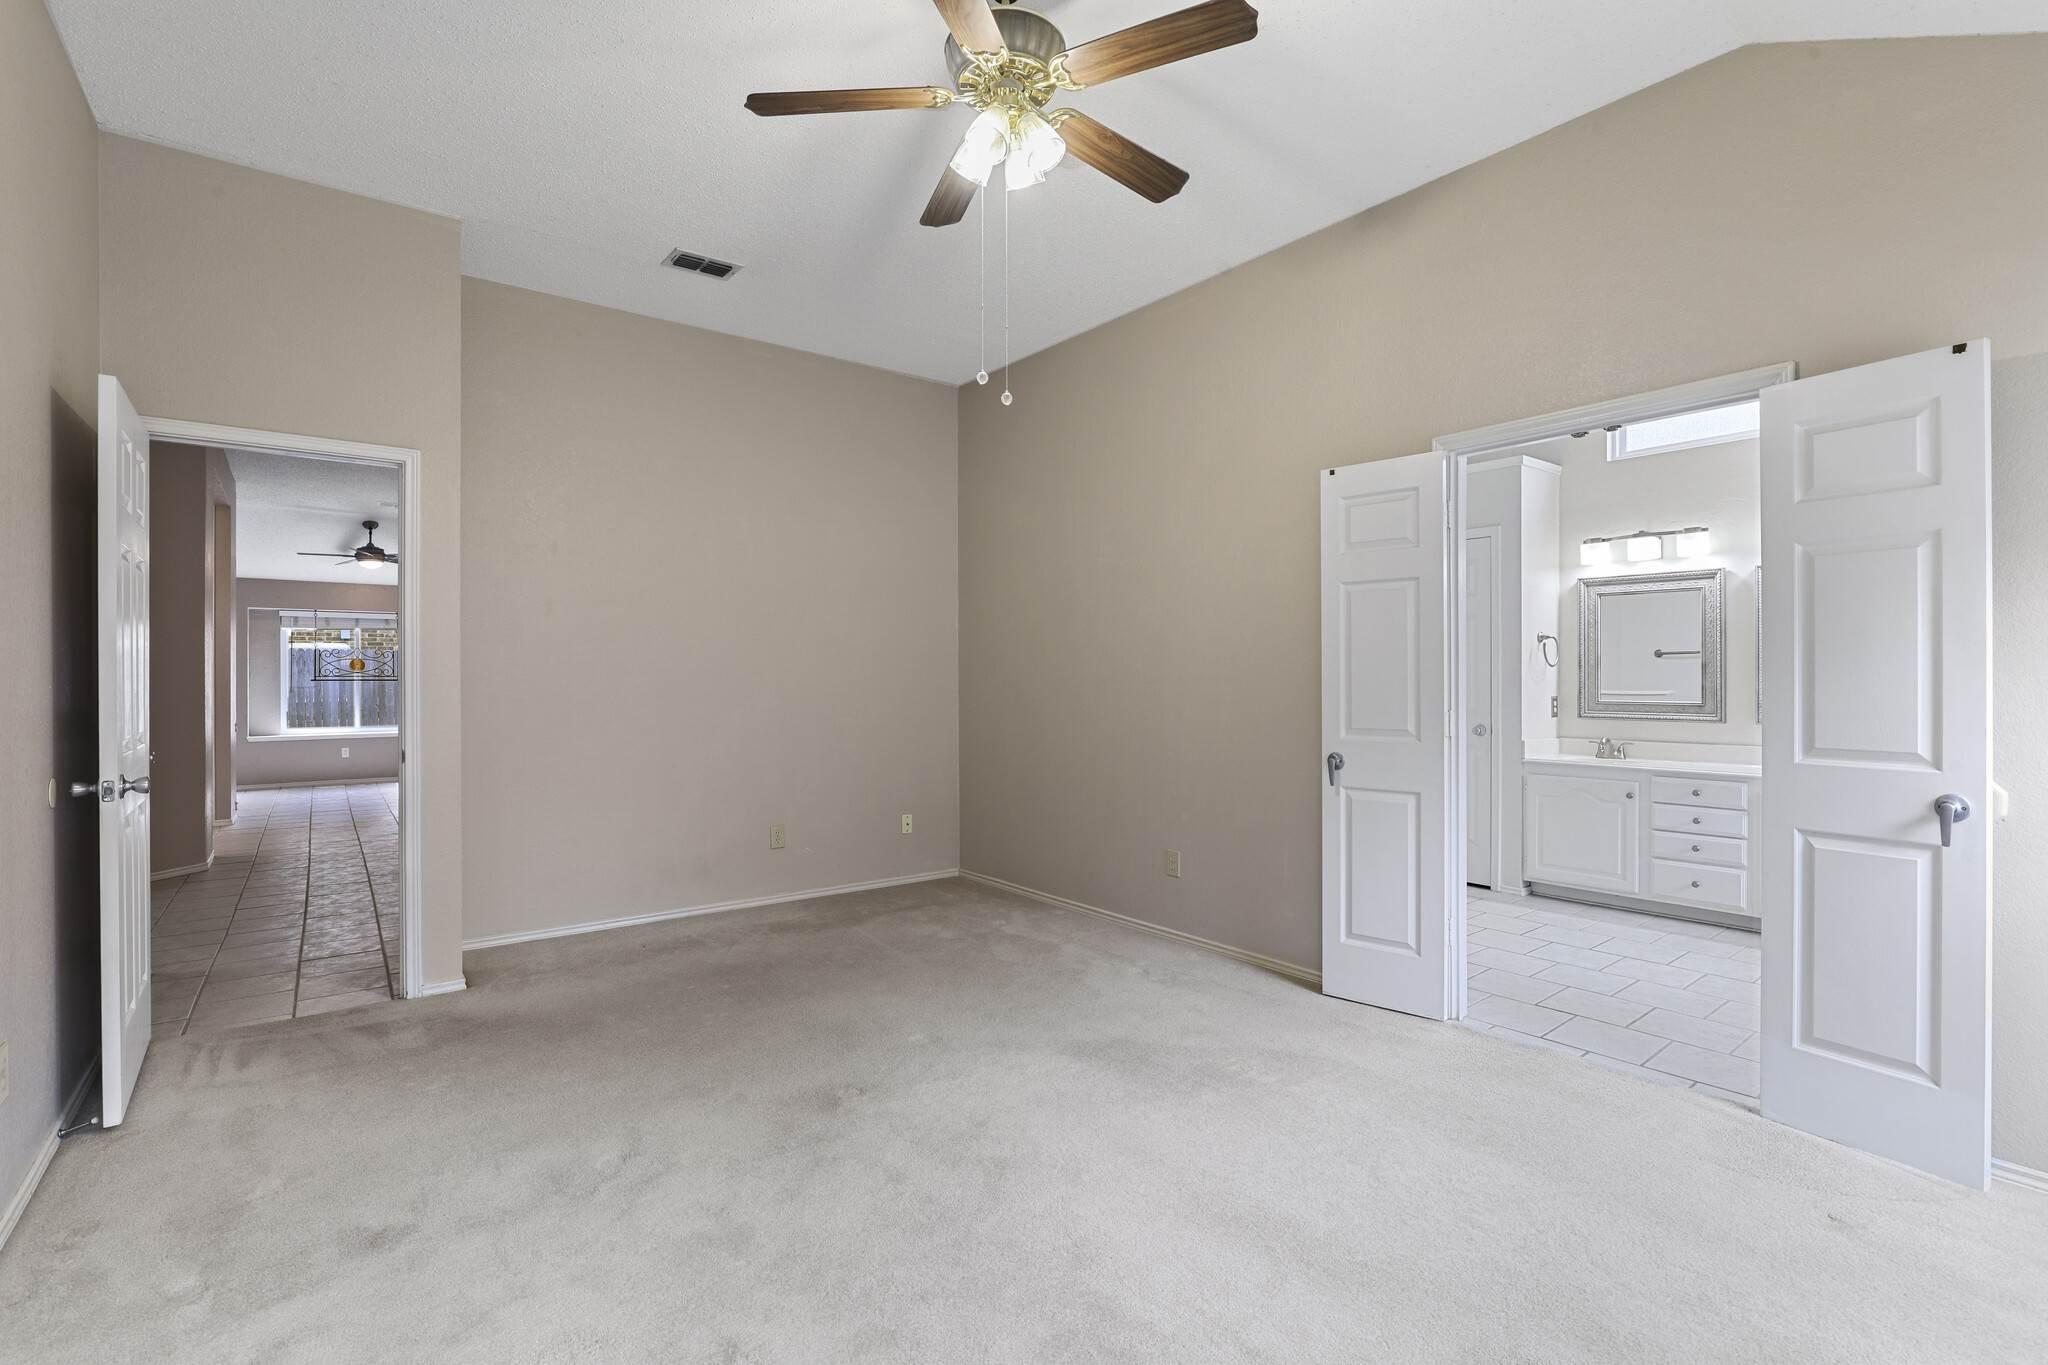 7917 Woodland Dr, North Richland Hills, TX 76182